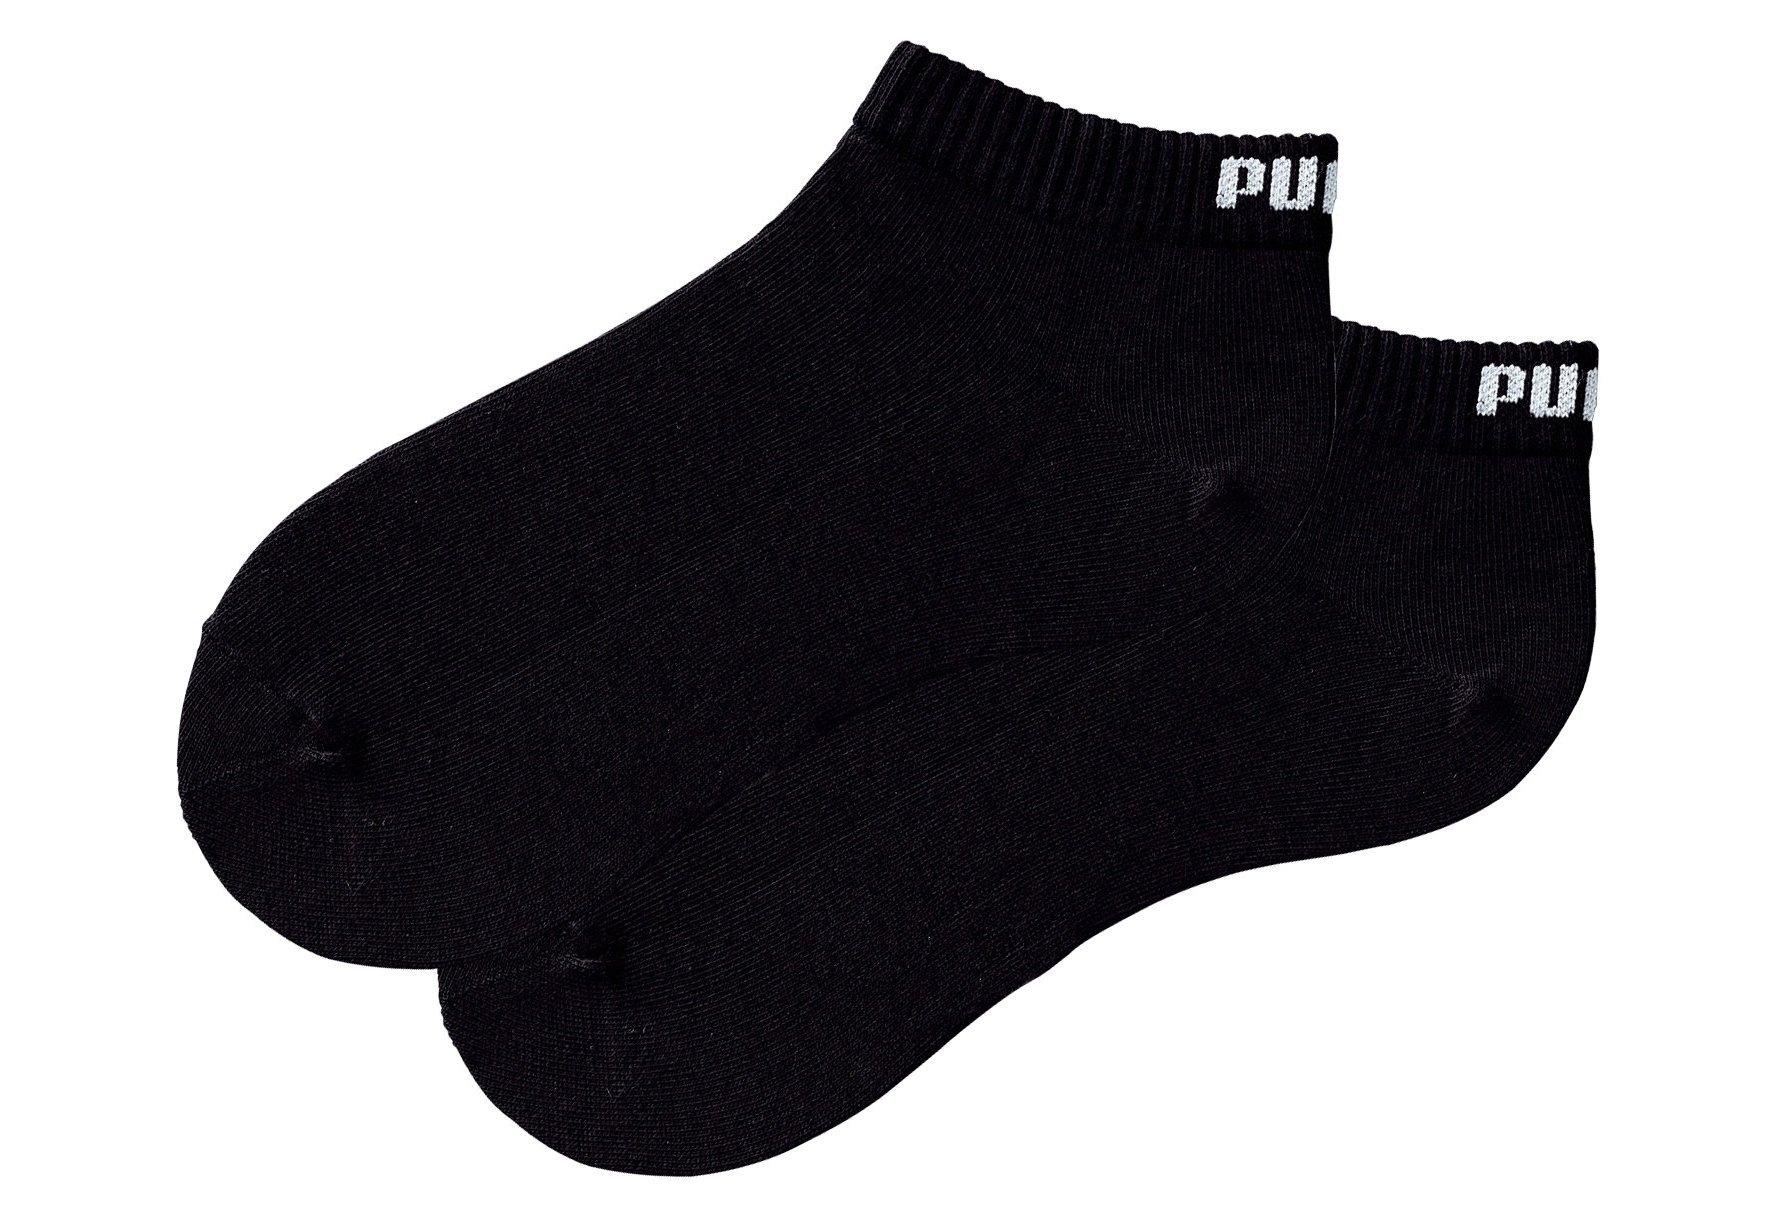 64e600f28b67b8 Puma Korte sokken, set van 6 paar vind je bij | LASCANA